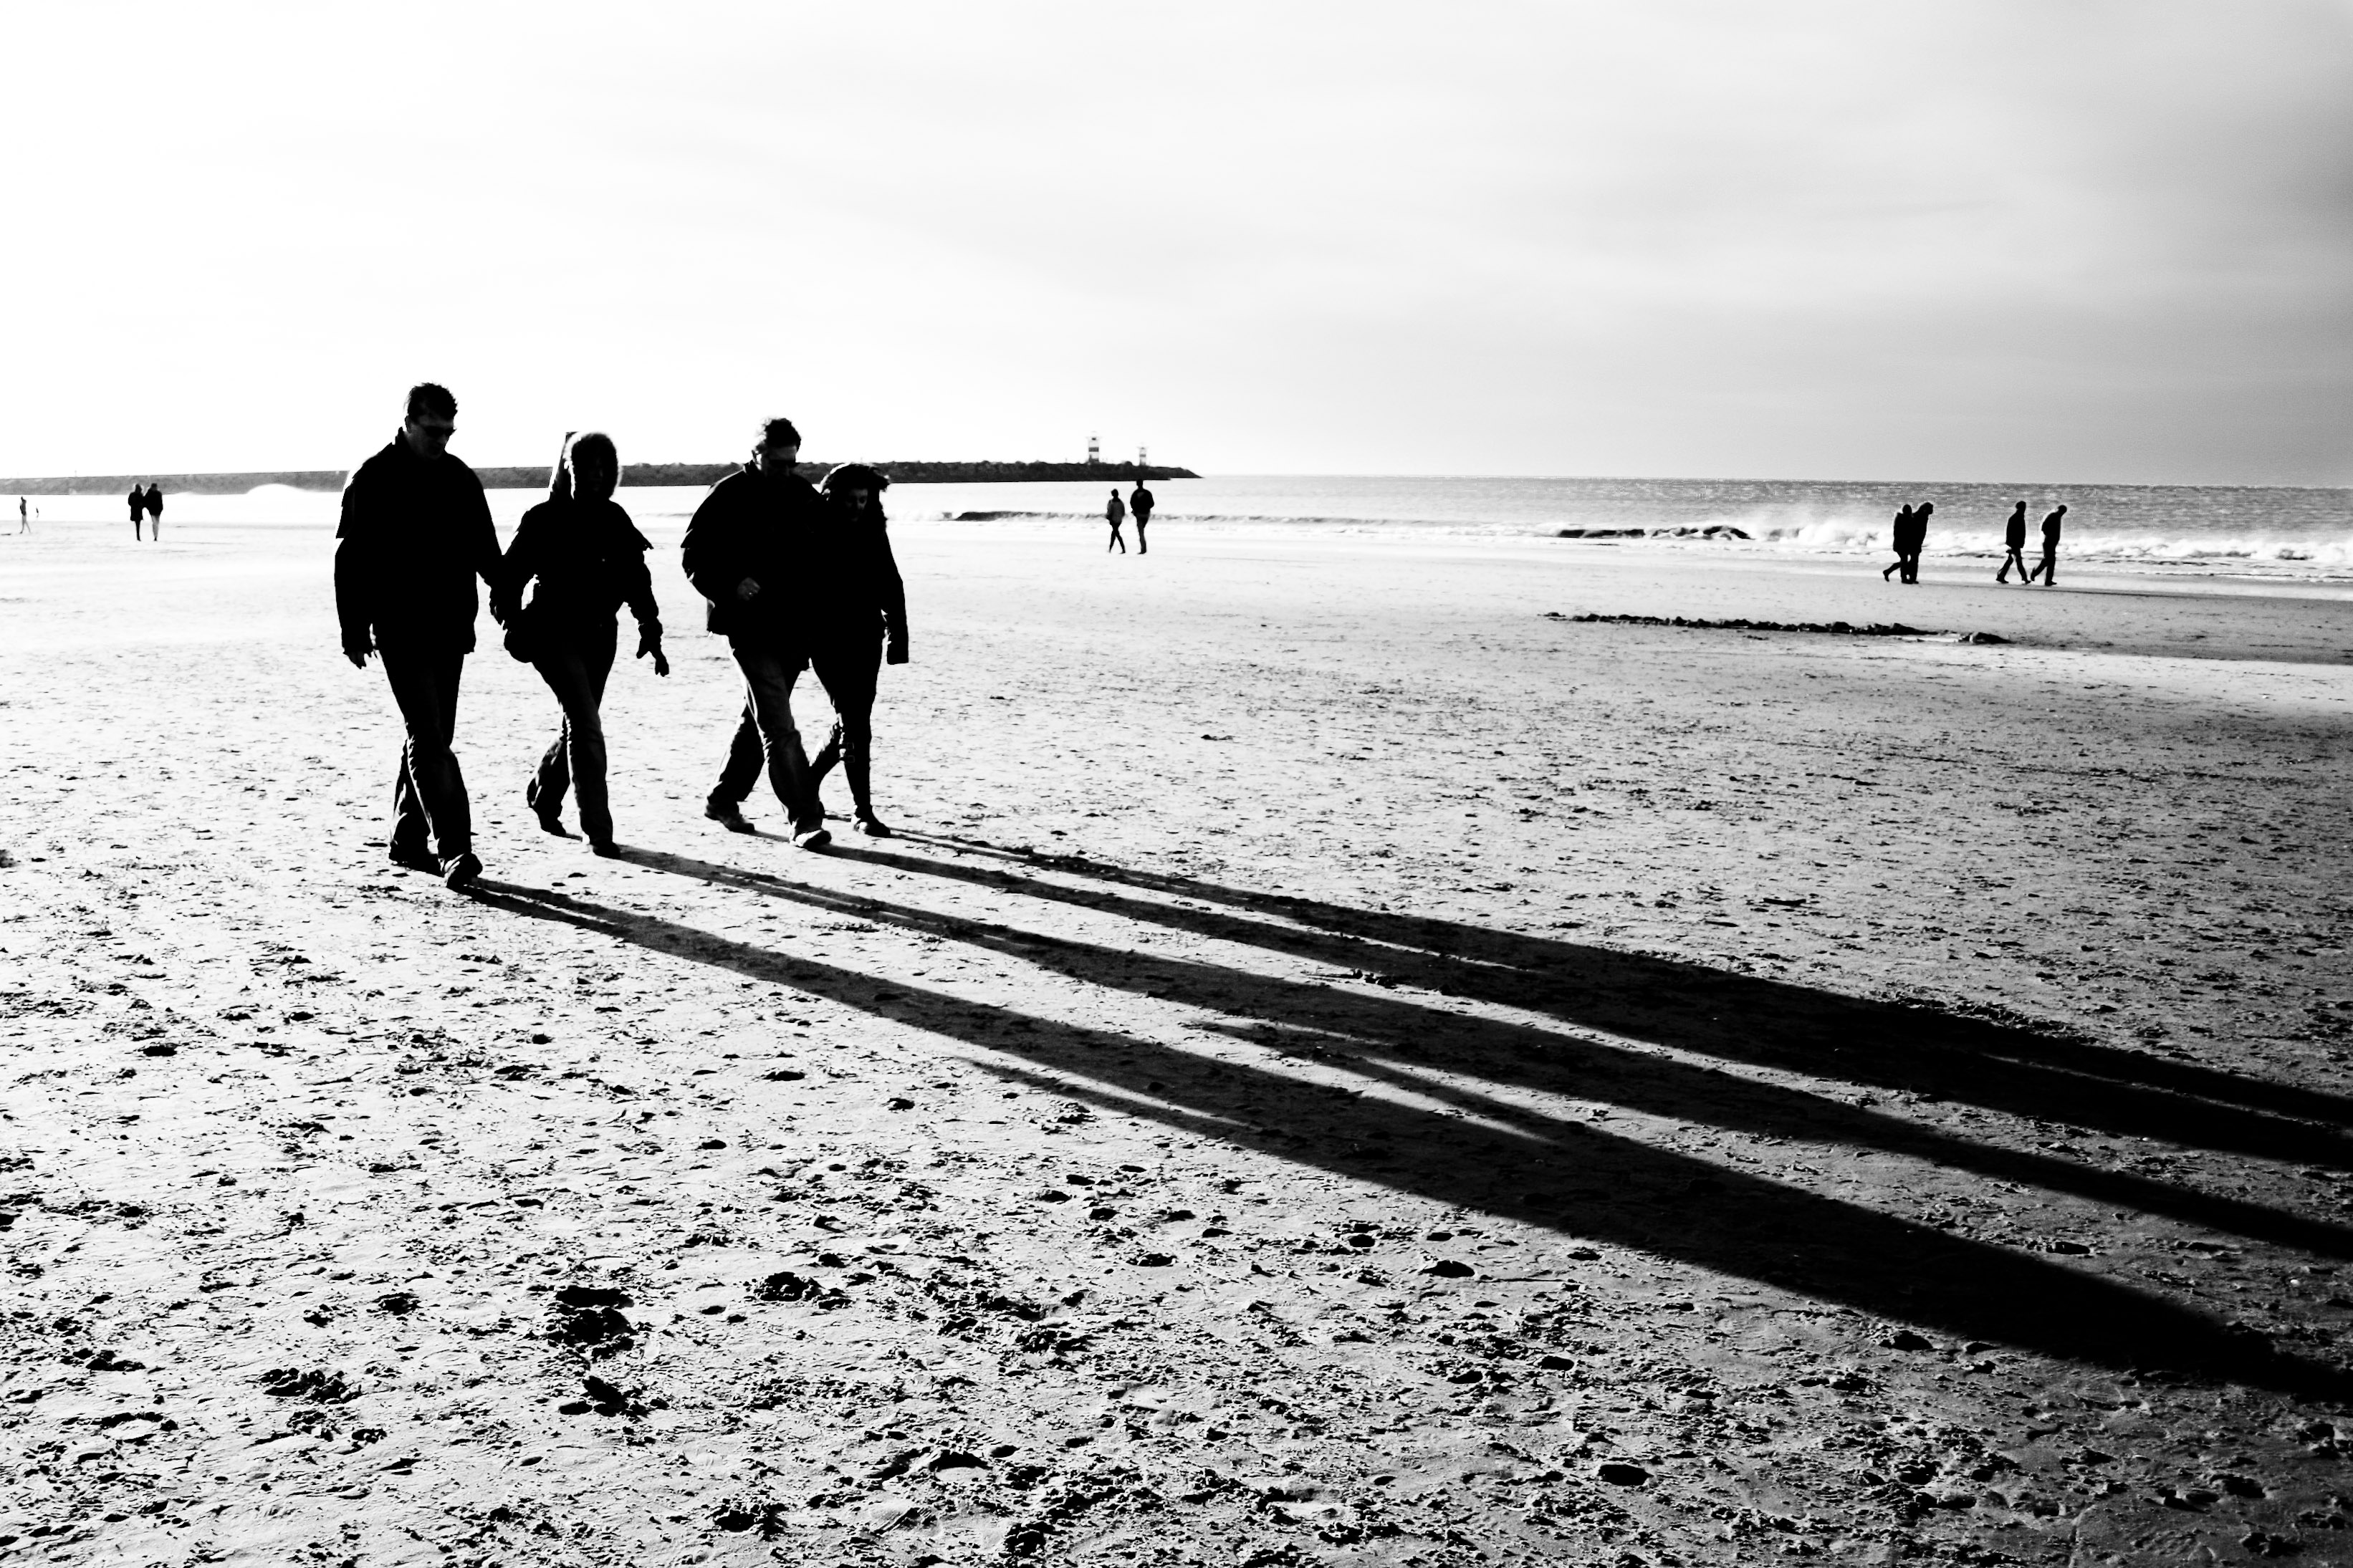 People walking on the beach photo